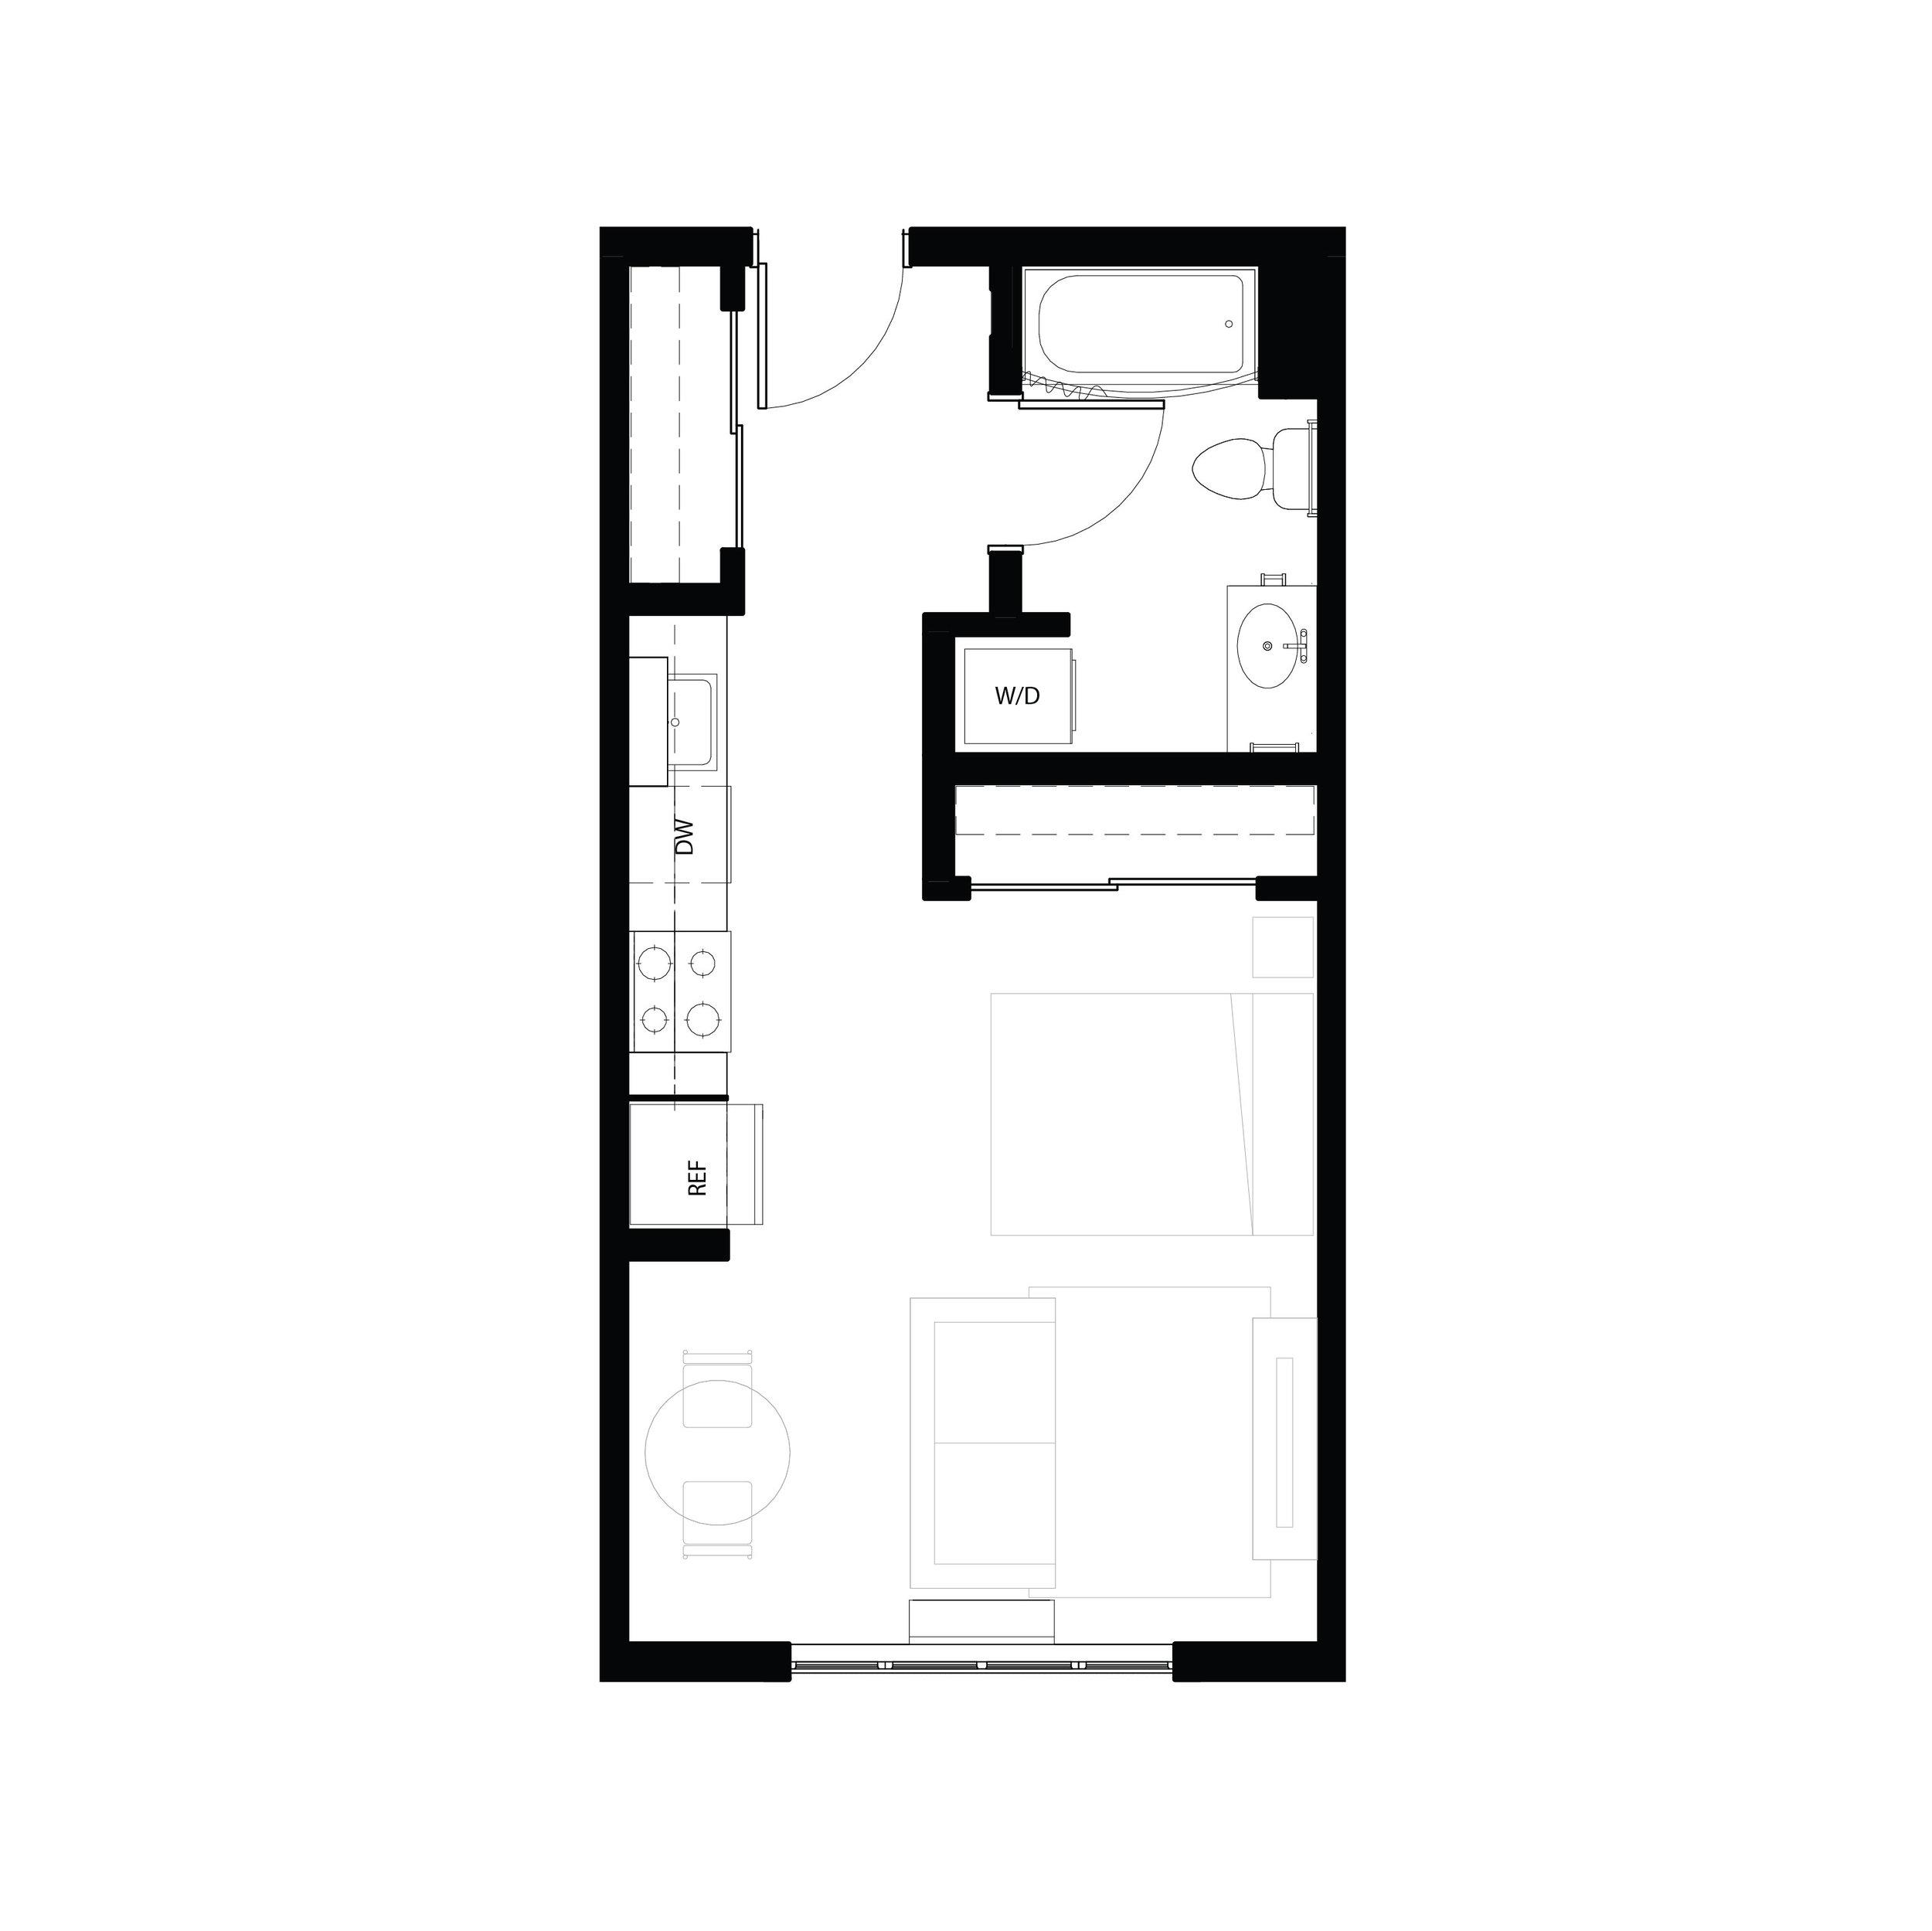 Studio 444 sq ft